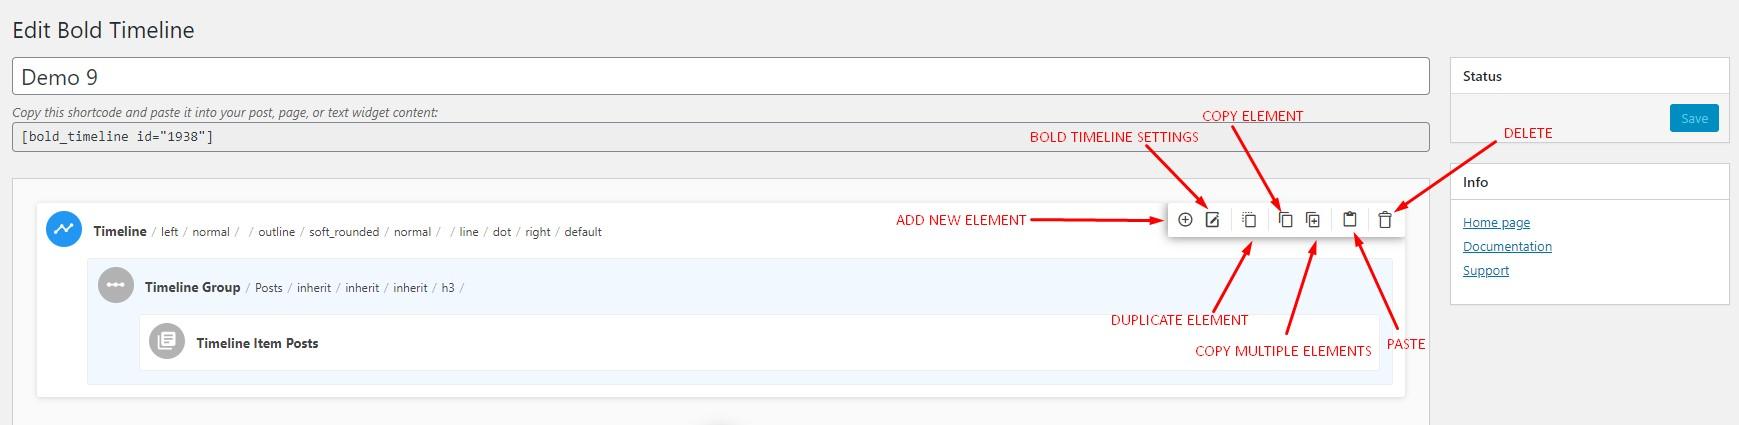 https://documentation.bold-themes.com/bold-timeline/wp-content/uploads/sites/53/2019/11/elements.jpg